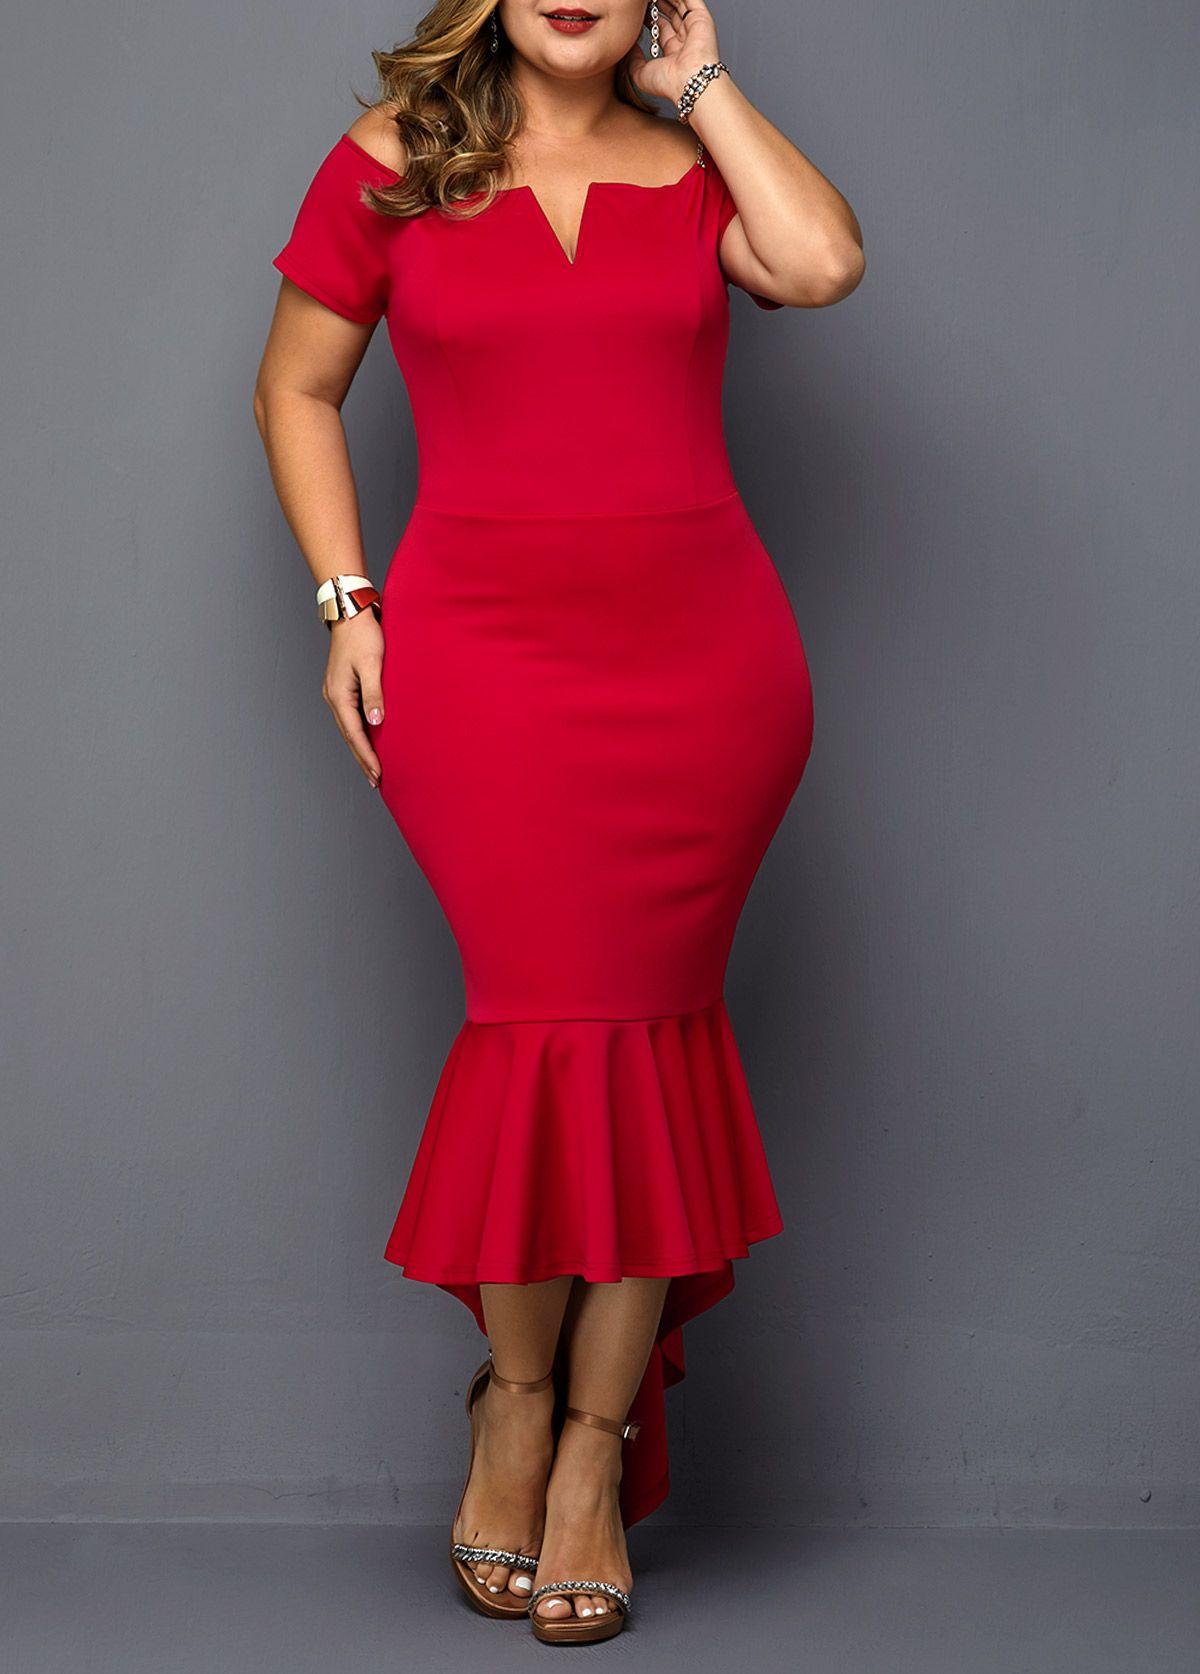 Notch neck plus size red mermaid dress red mermaid dress